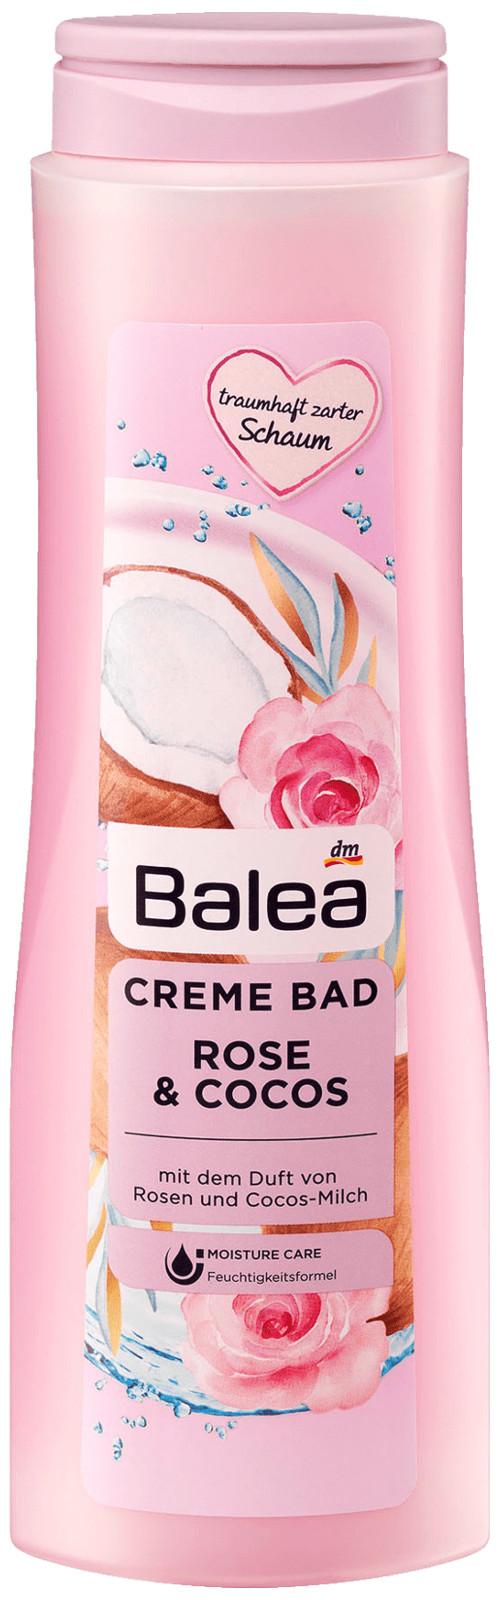 Balea Creme Bad Róża i Kokos Płyn Kąpieli 750ml DE